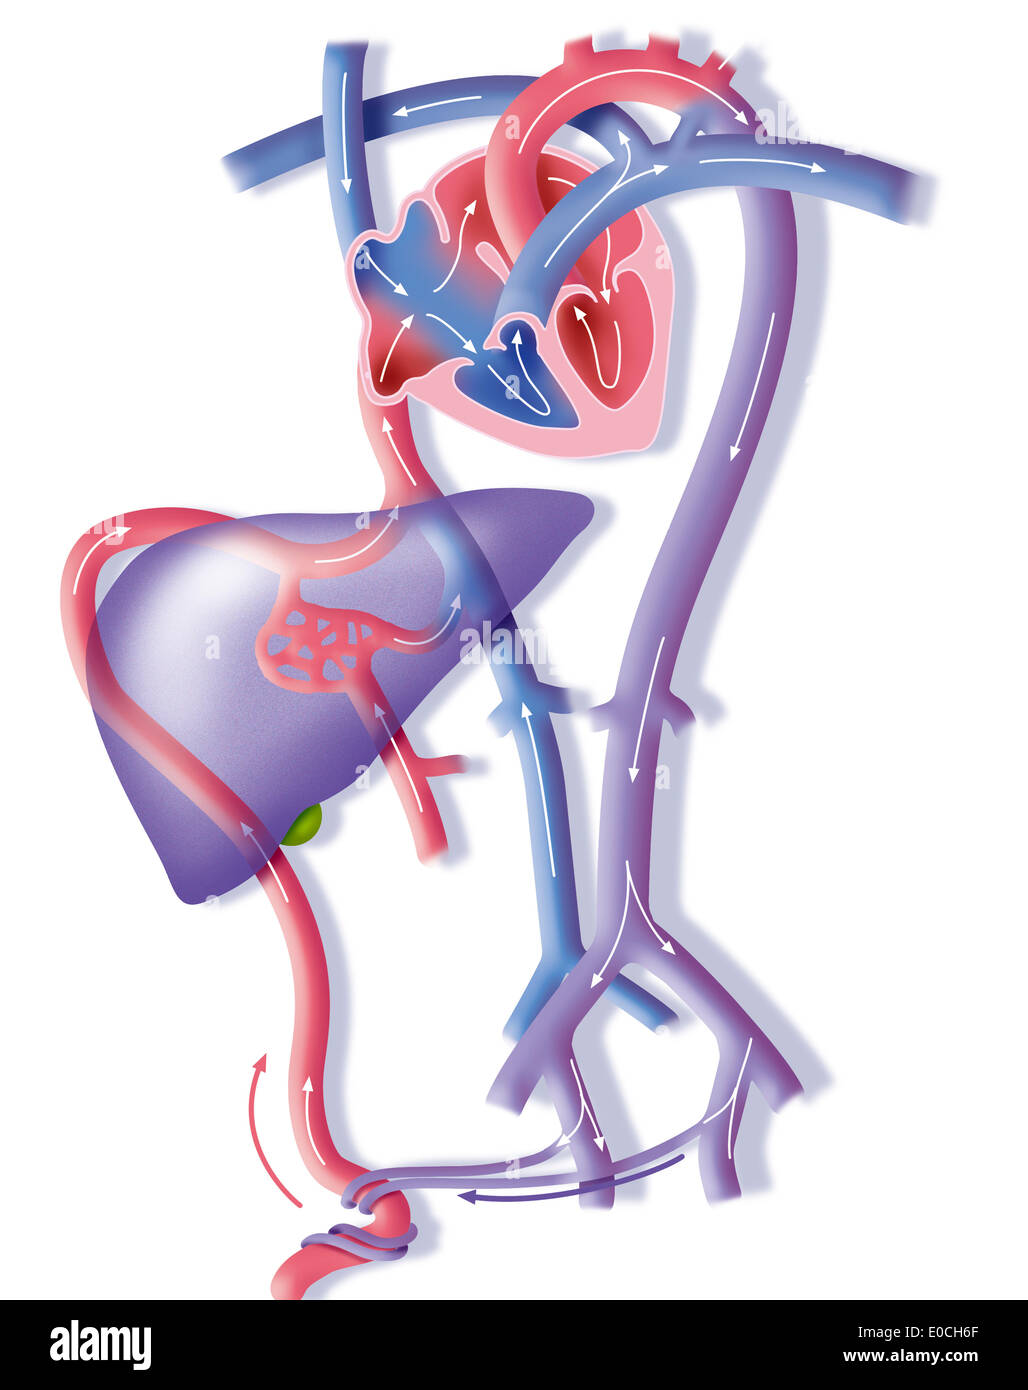 Fetal blood circulation - Stock Image